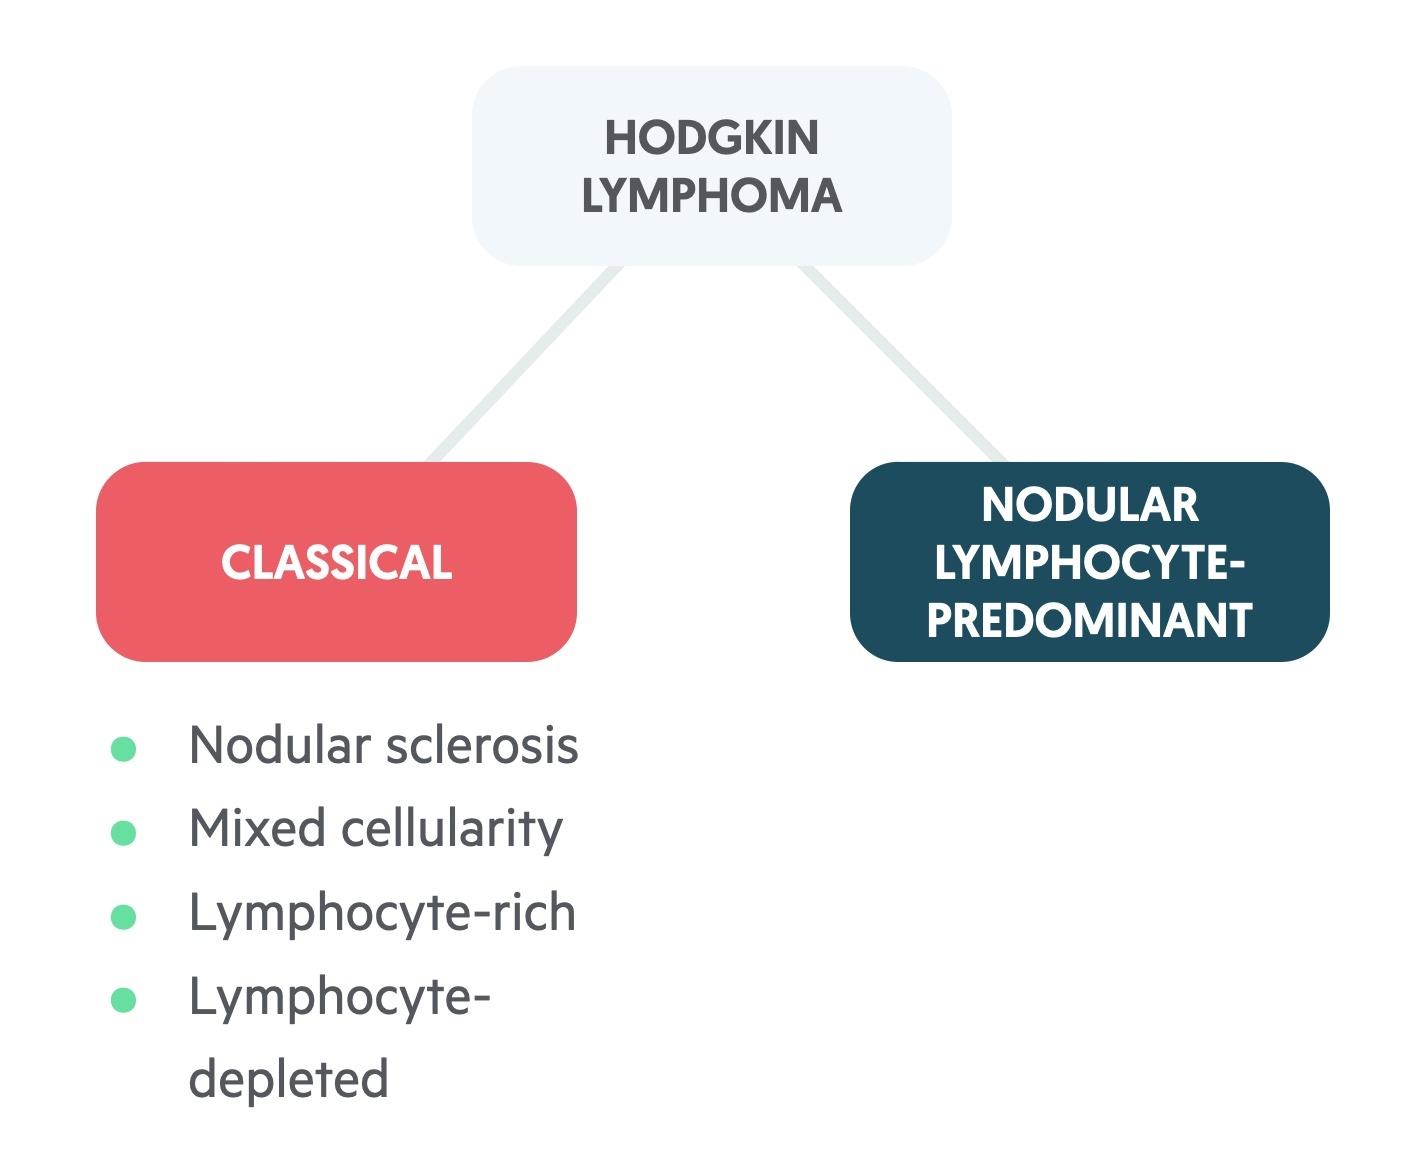 Types of Hodgkins Lymphoma